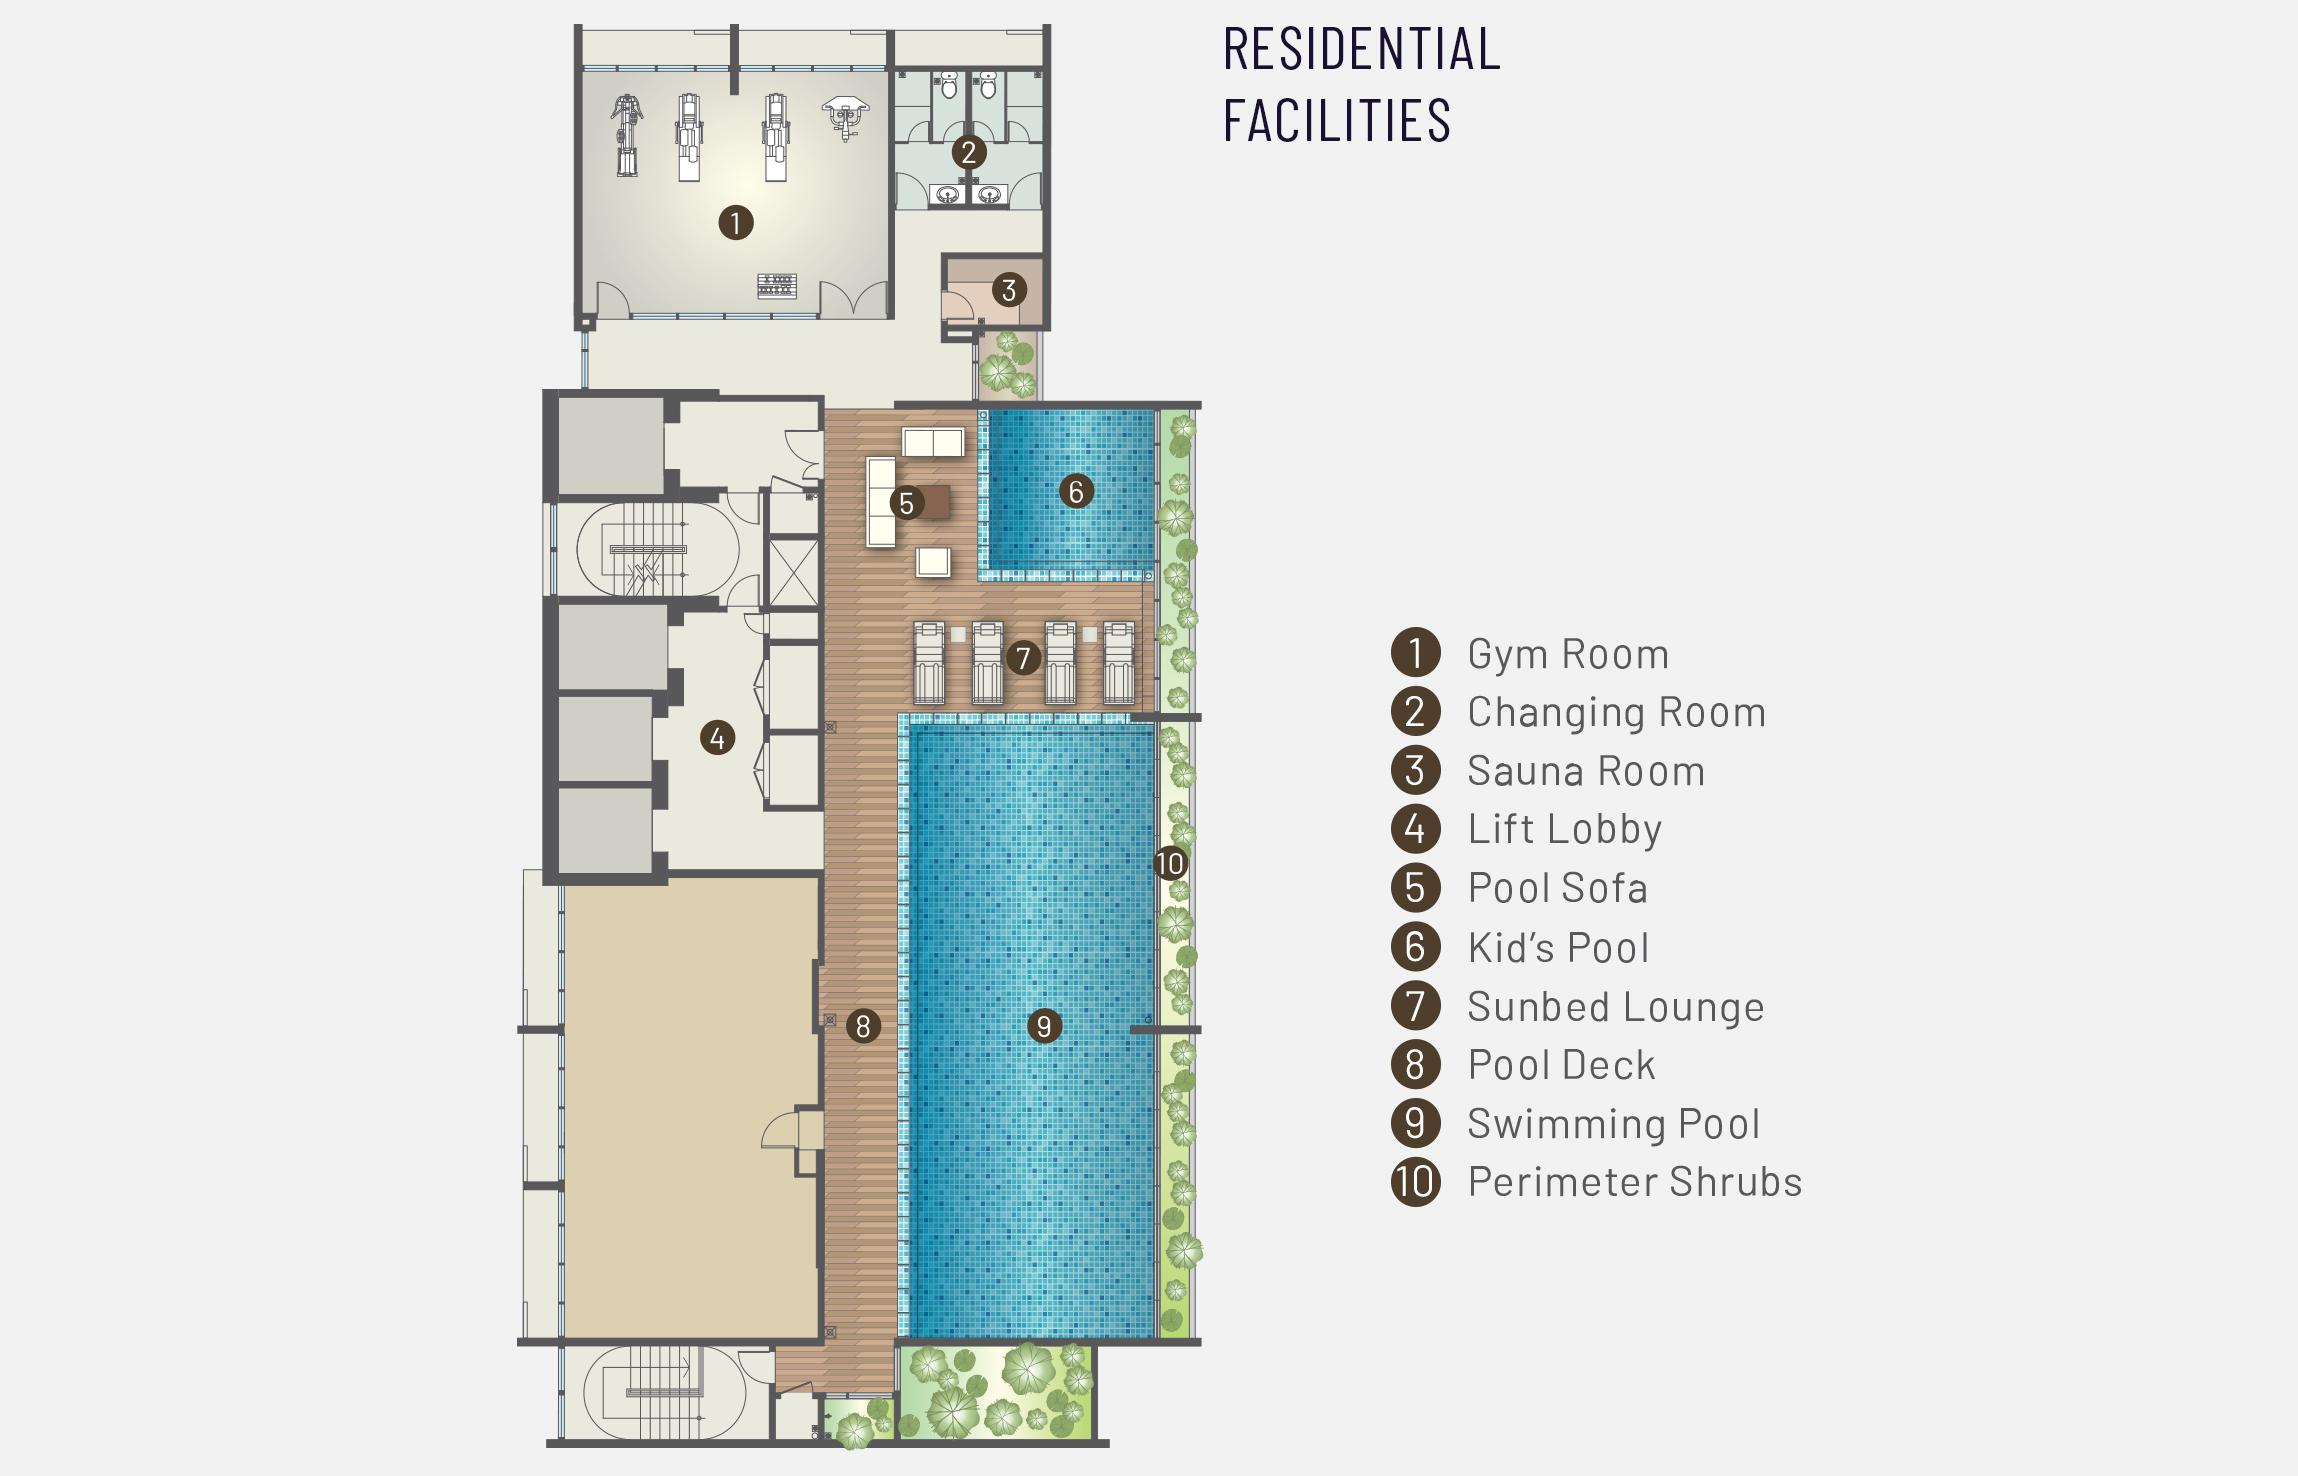 Level 42 plan of Alfa Bangsar that shows residential facilities like the gym room, changing room, sauna room, lift lobby, pool sofa, kid's pool, sunbed lounge, pool deck, swimming pool, and perimeter shrubs